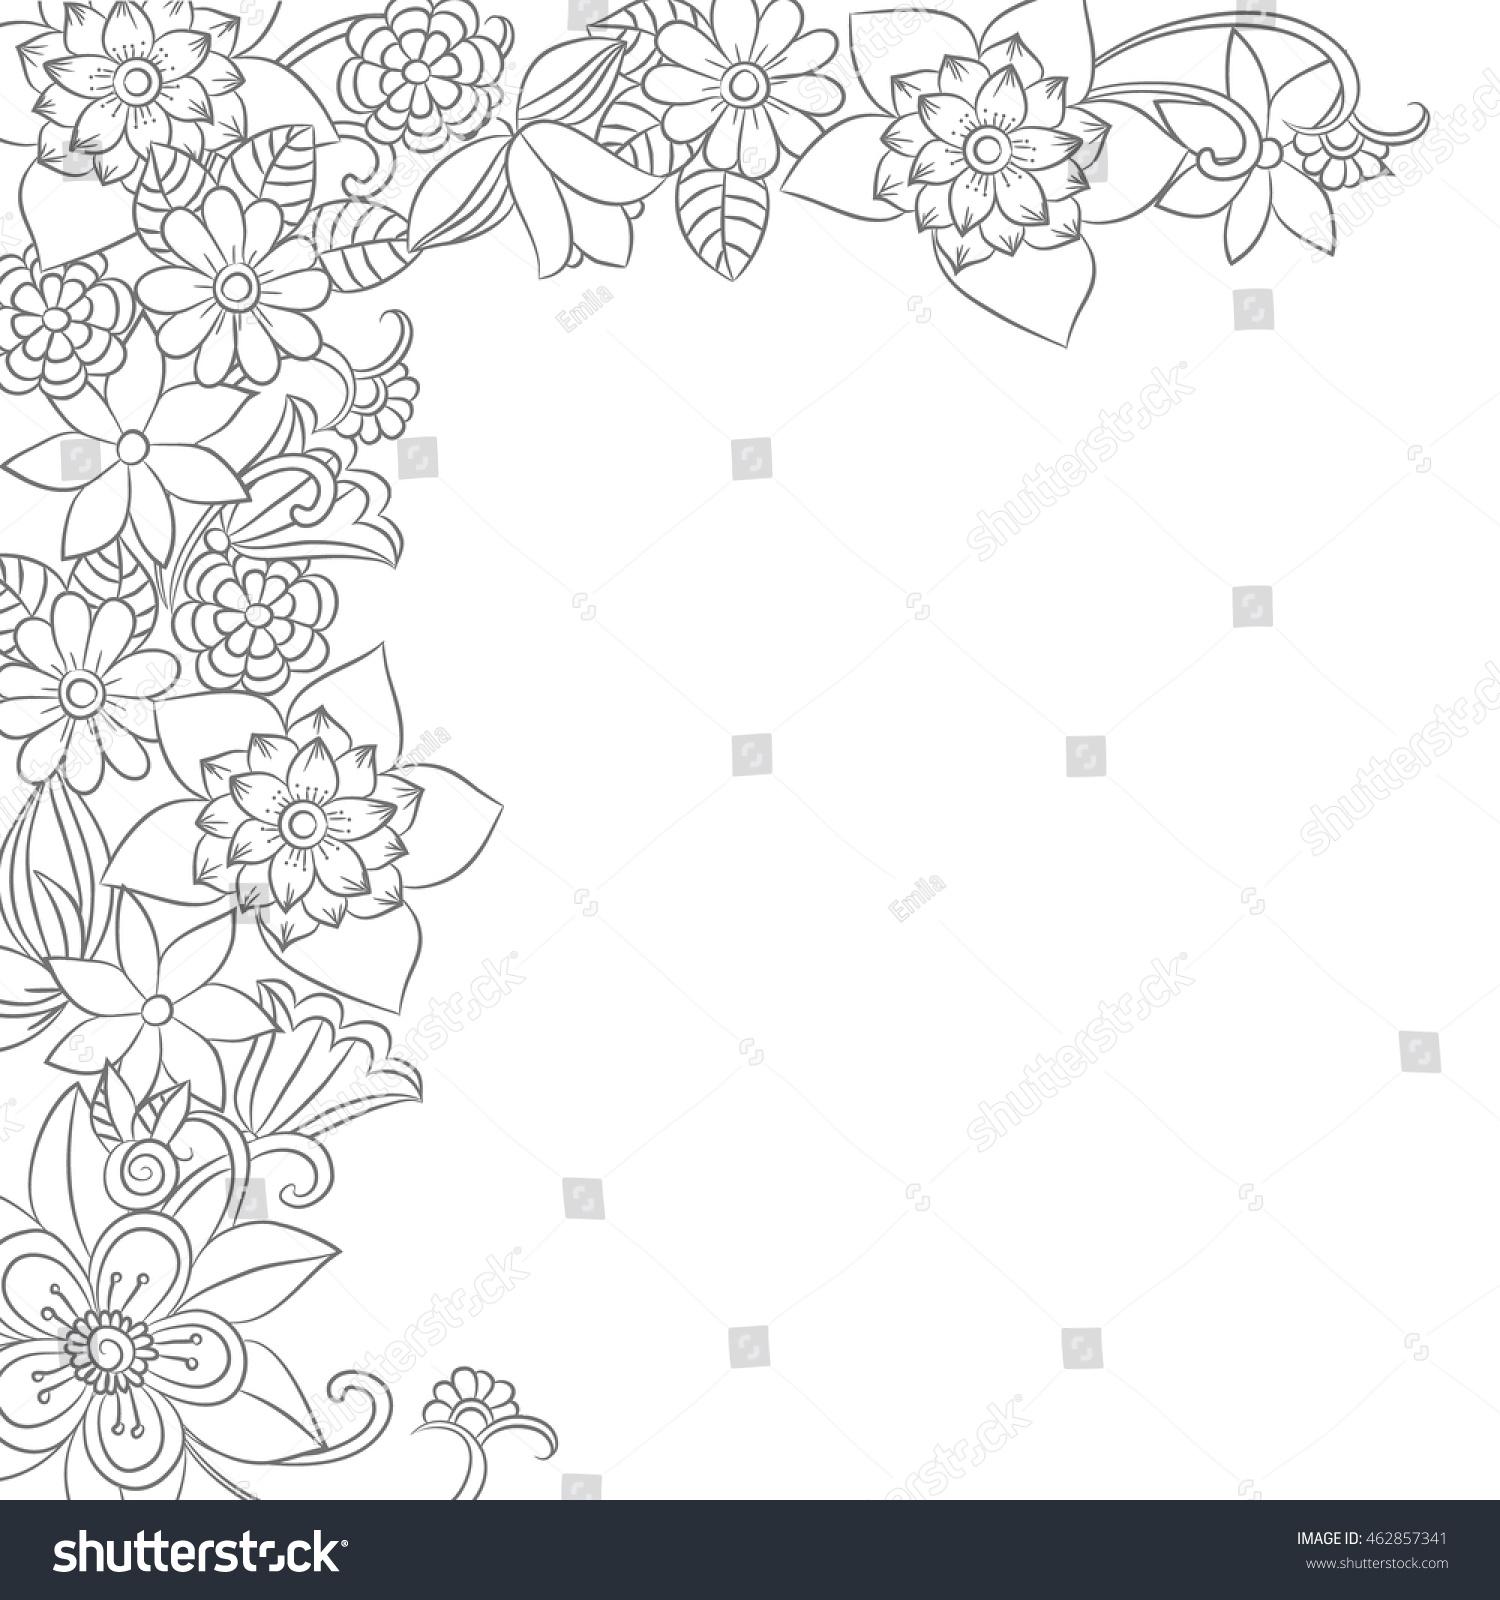 Vector Monochrome Flower Frame Corner Floral Elements In Black And